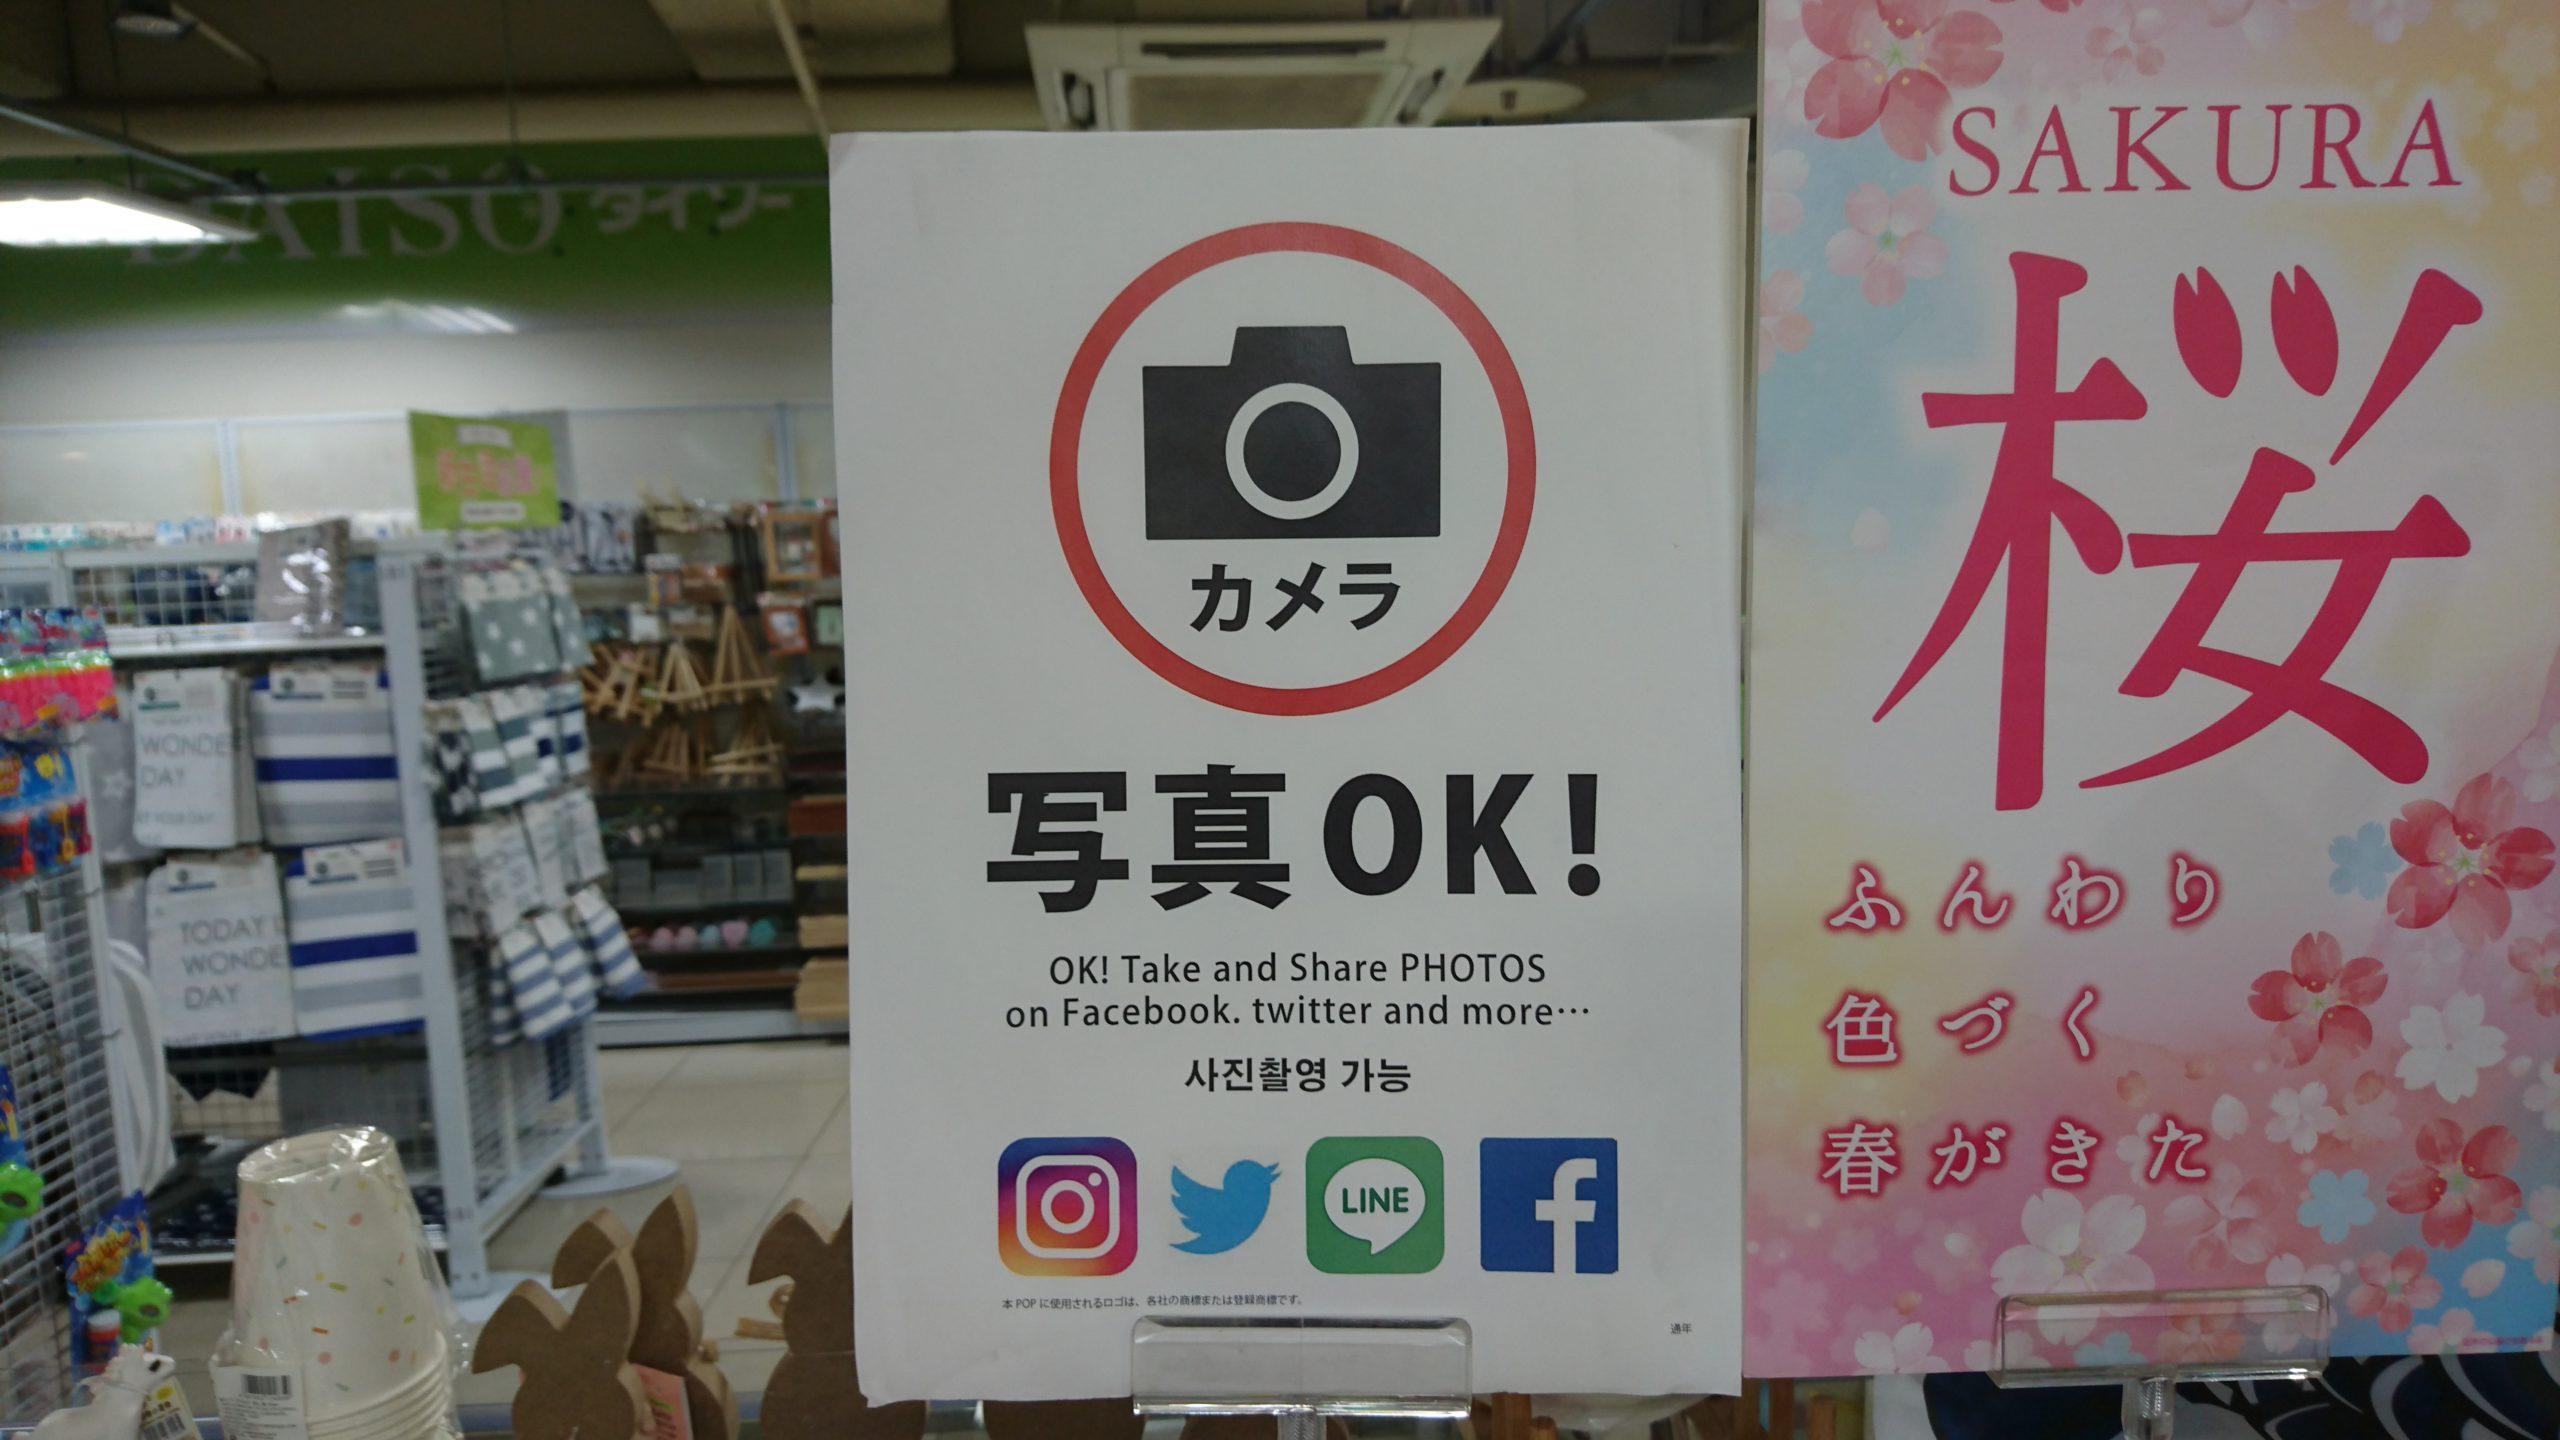 北海道内で店内写真撮影OKの店舗一覧